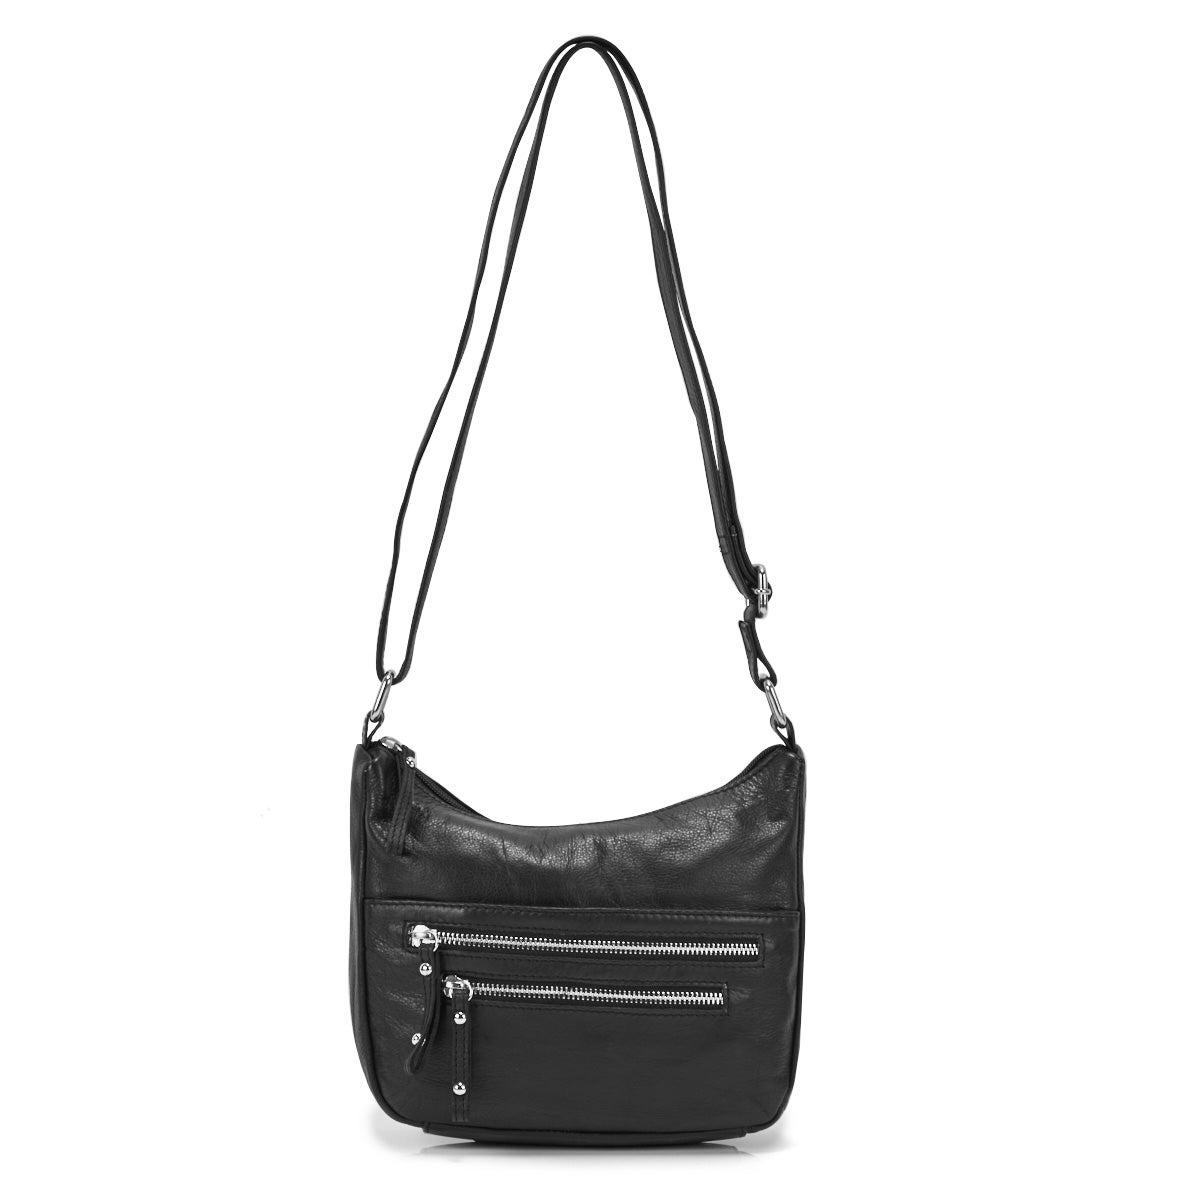 Lds Carrie black crossbody bag